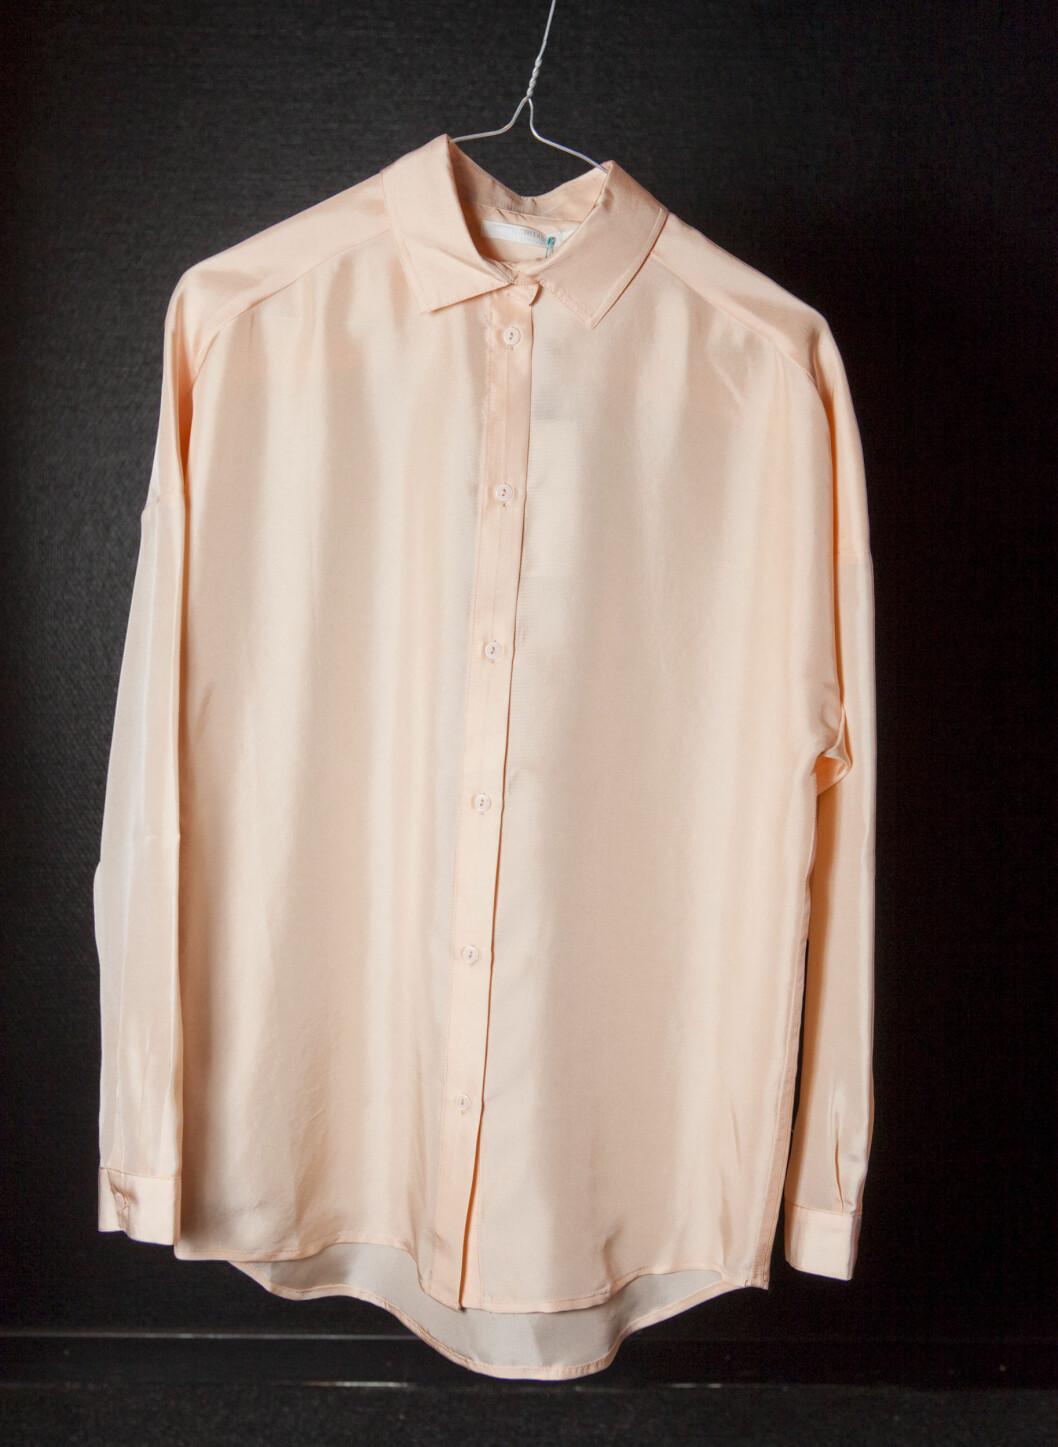 Ferskenfarget skjorte i silke. Foto: Per Ervland